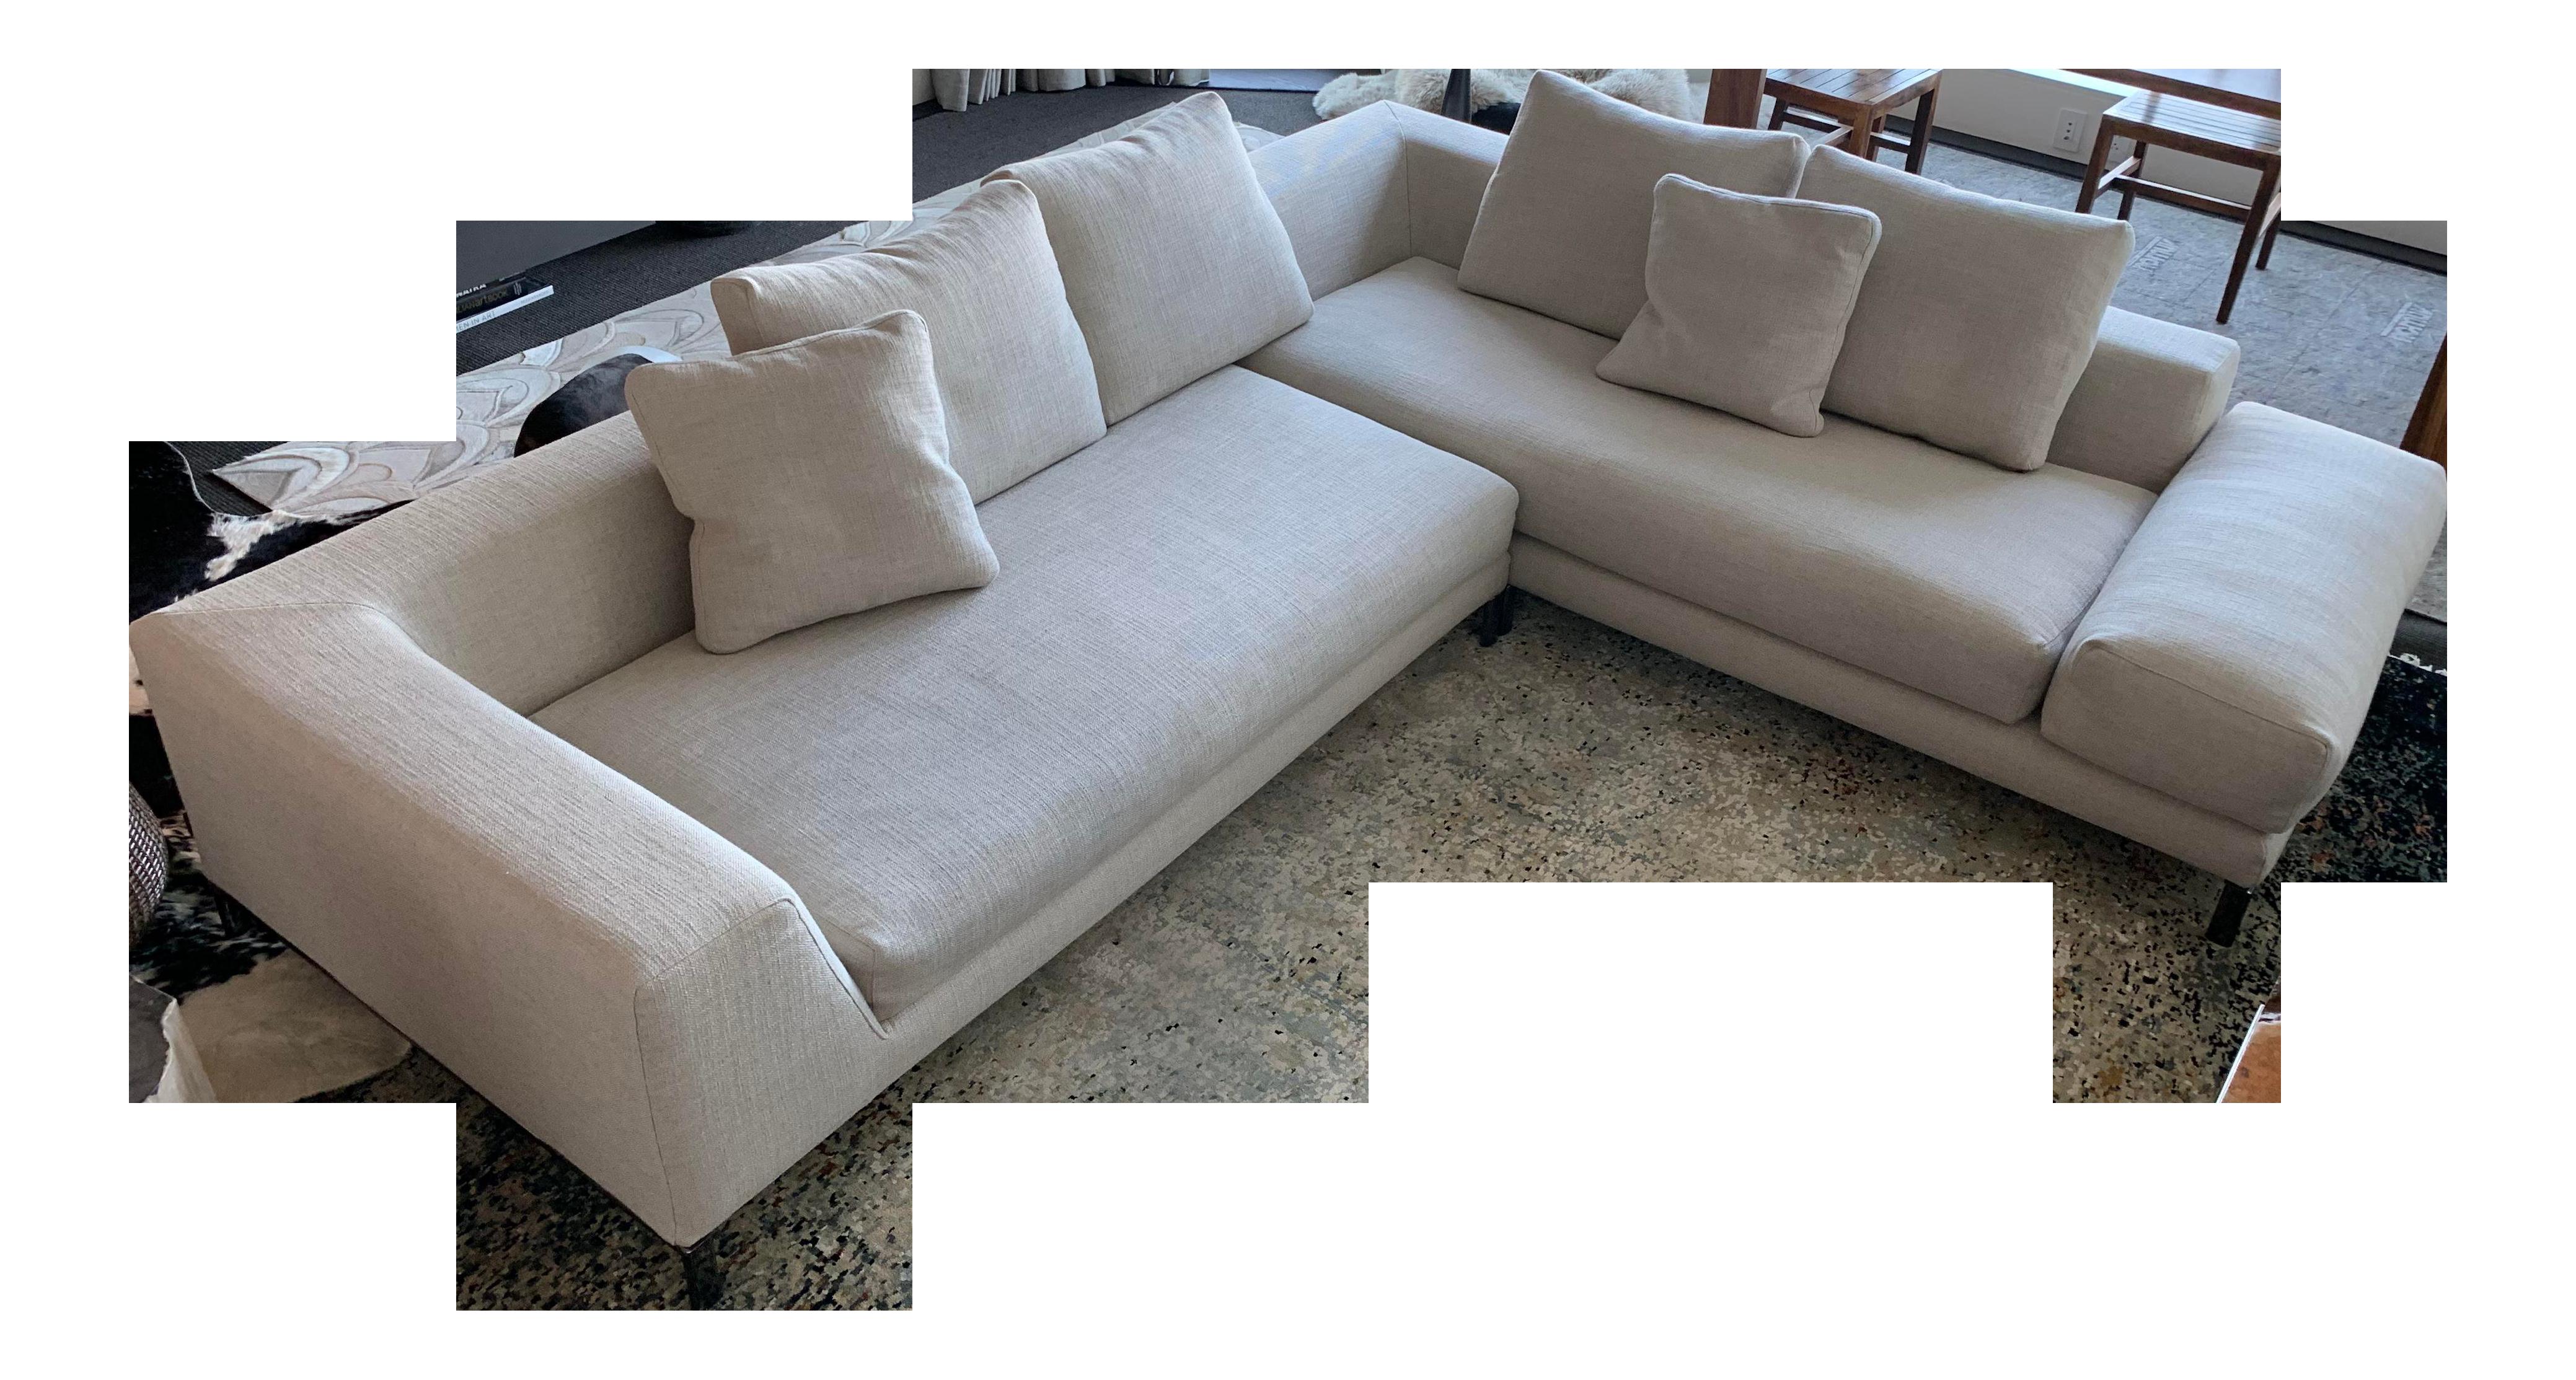 Astonishing Minotti Hamilton Island Sectional Sofa Caraccident5 Cool Chair Designs And Ideas Caraccident5Info